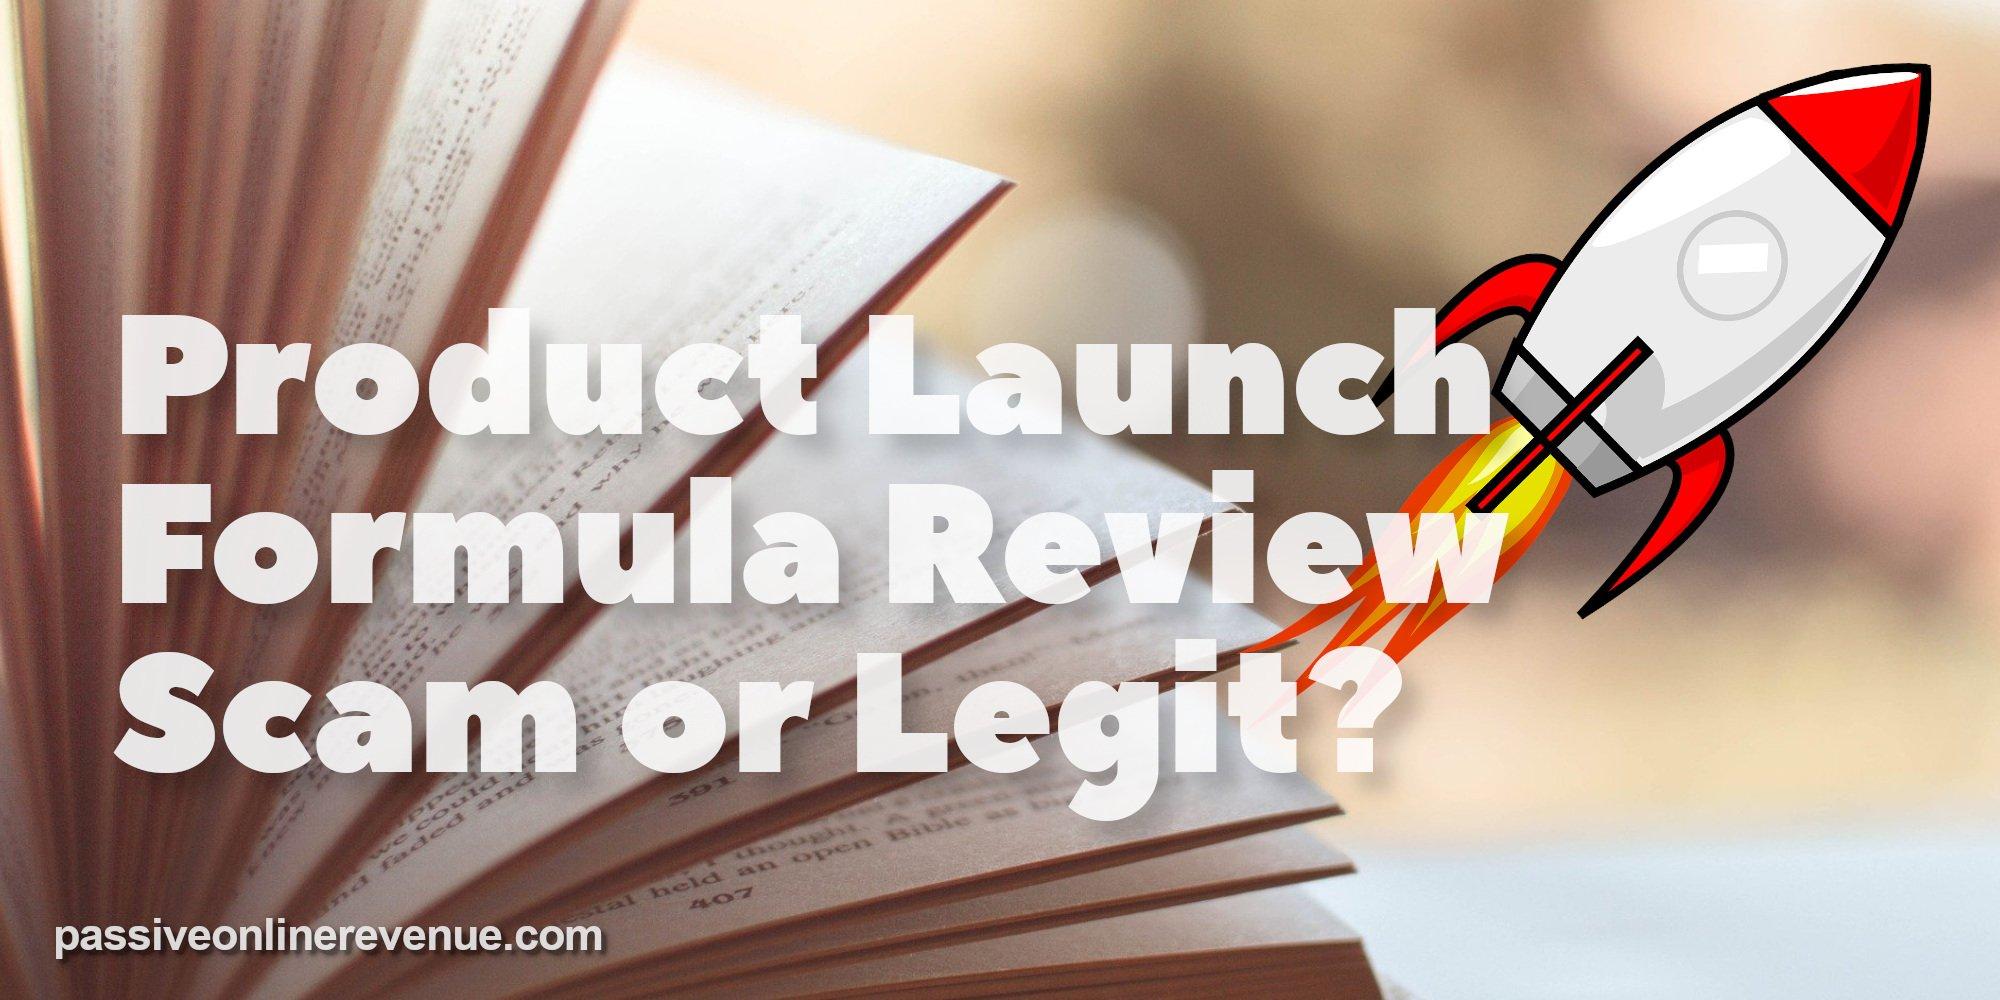 Product Launch Formula Review - Scam or Legit?